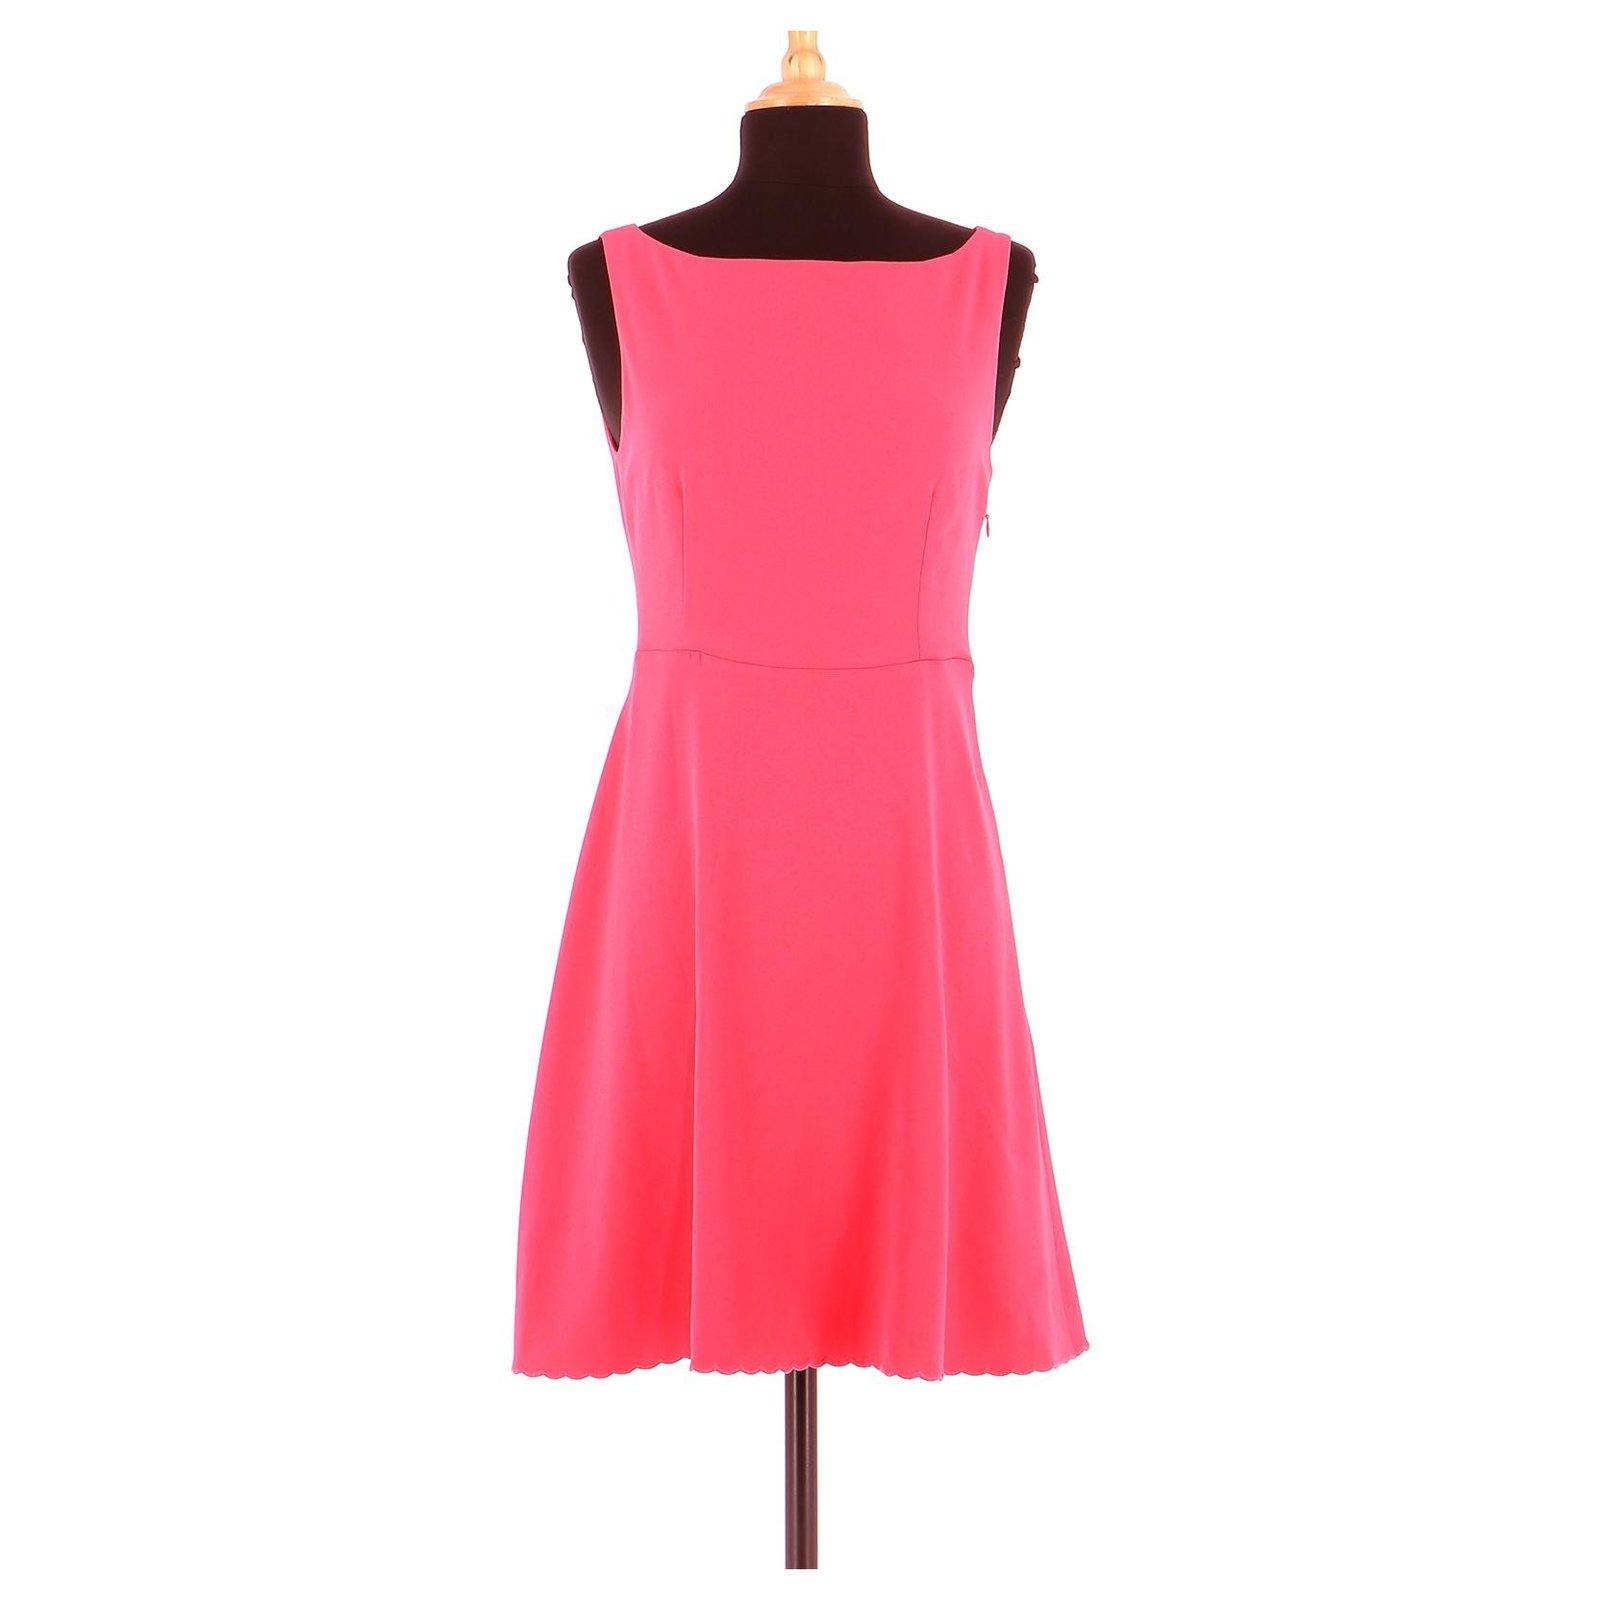 Claudie Pierlot Robe Dresses Triacetate Pink Ref 153137 Joli Closet